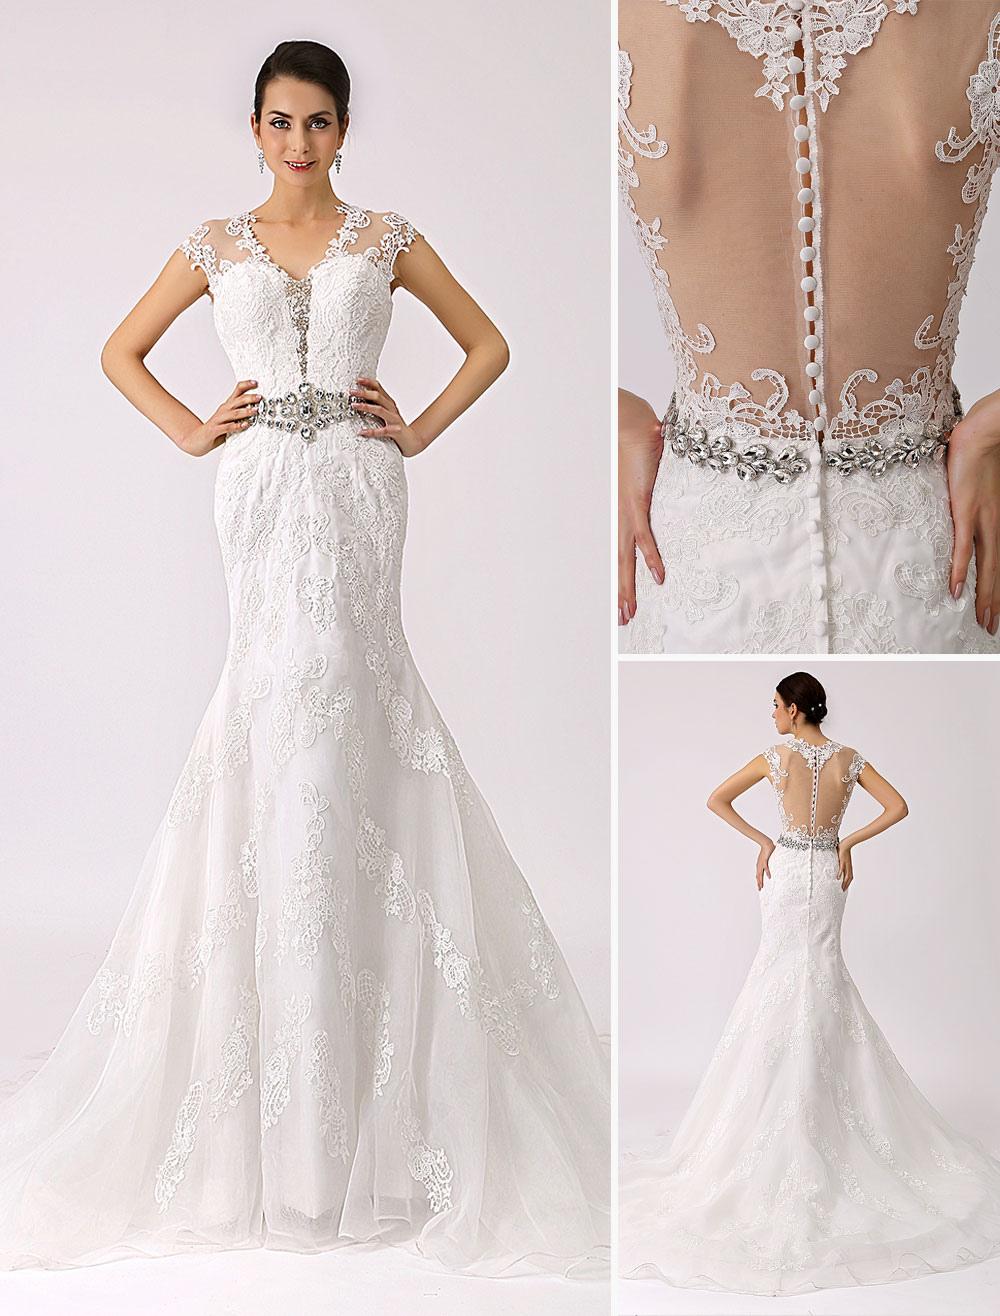 V Neck Trumpet Lace Wedding Dress with Sheer Back Milanoo